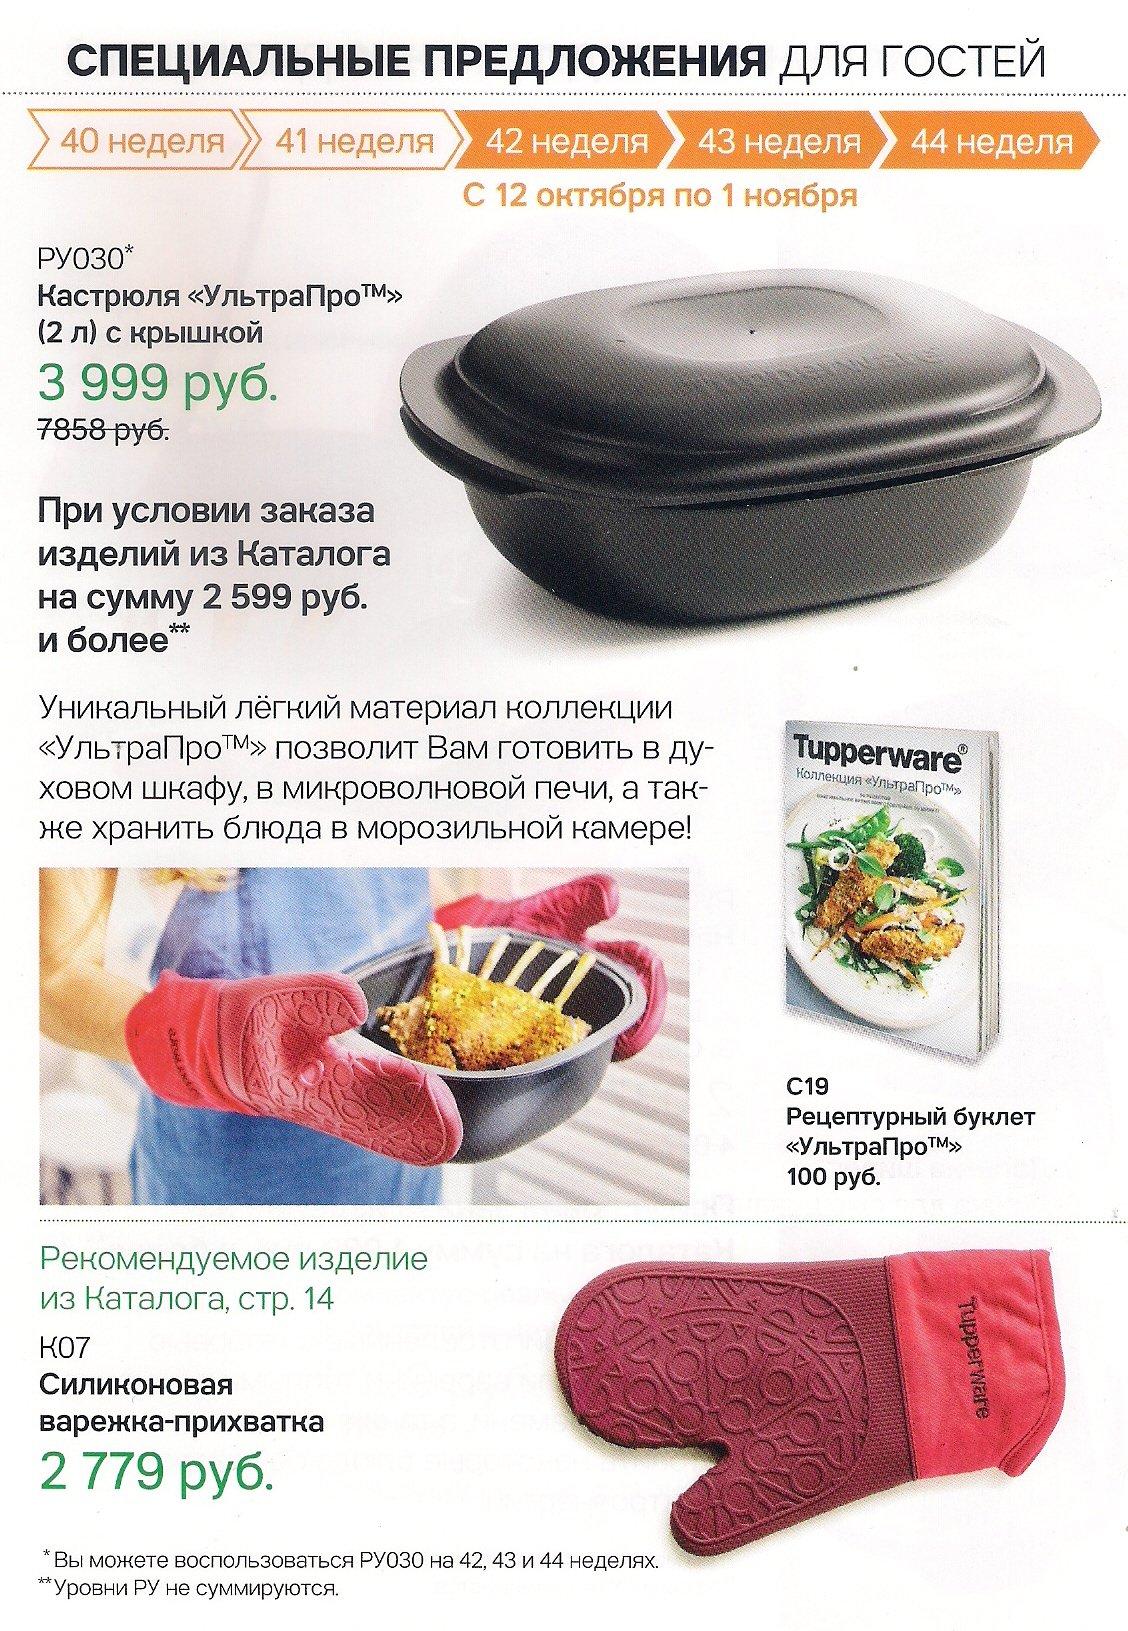 https://tupperware-online.ru/images/upload/14d%20(2).jpg